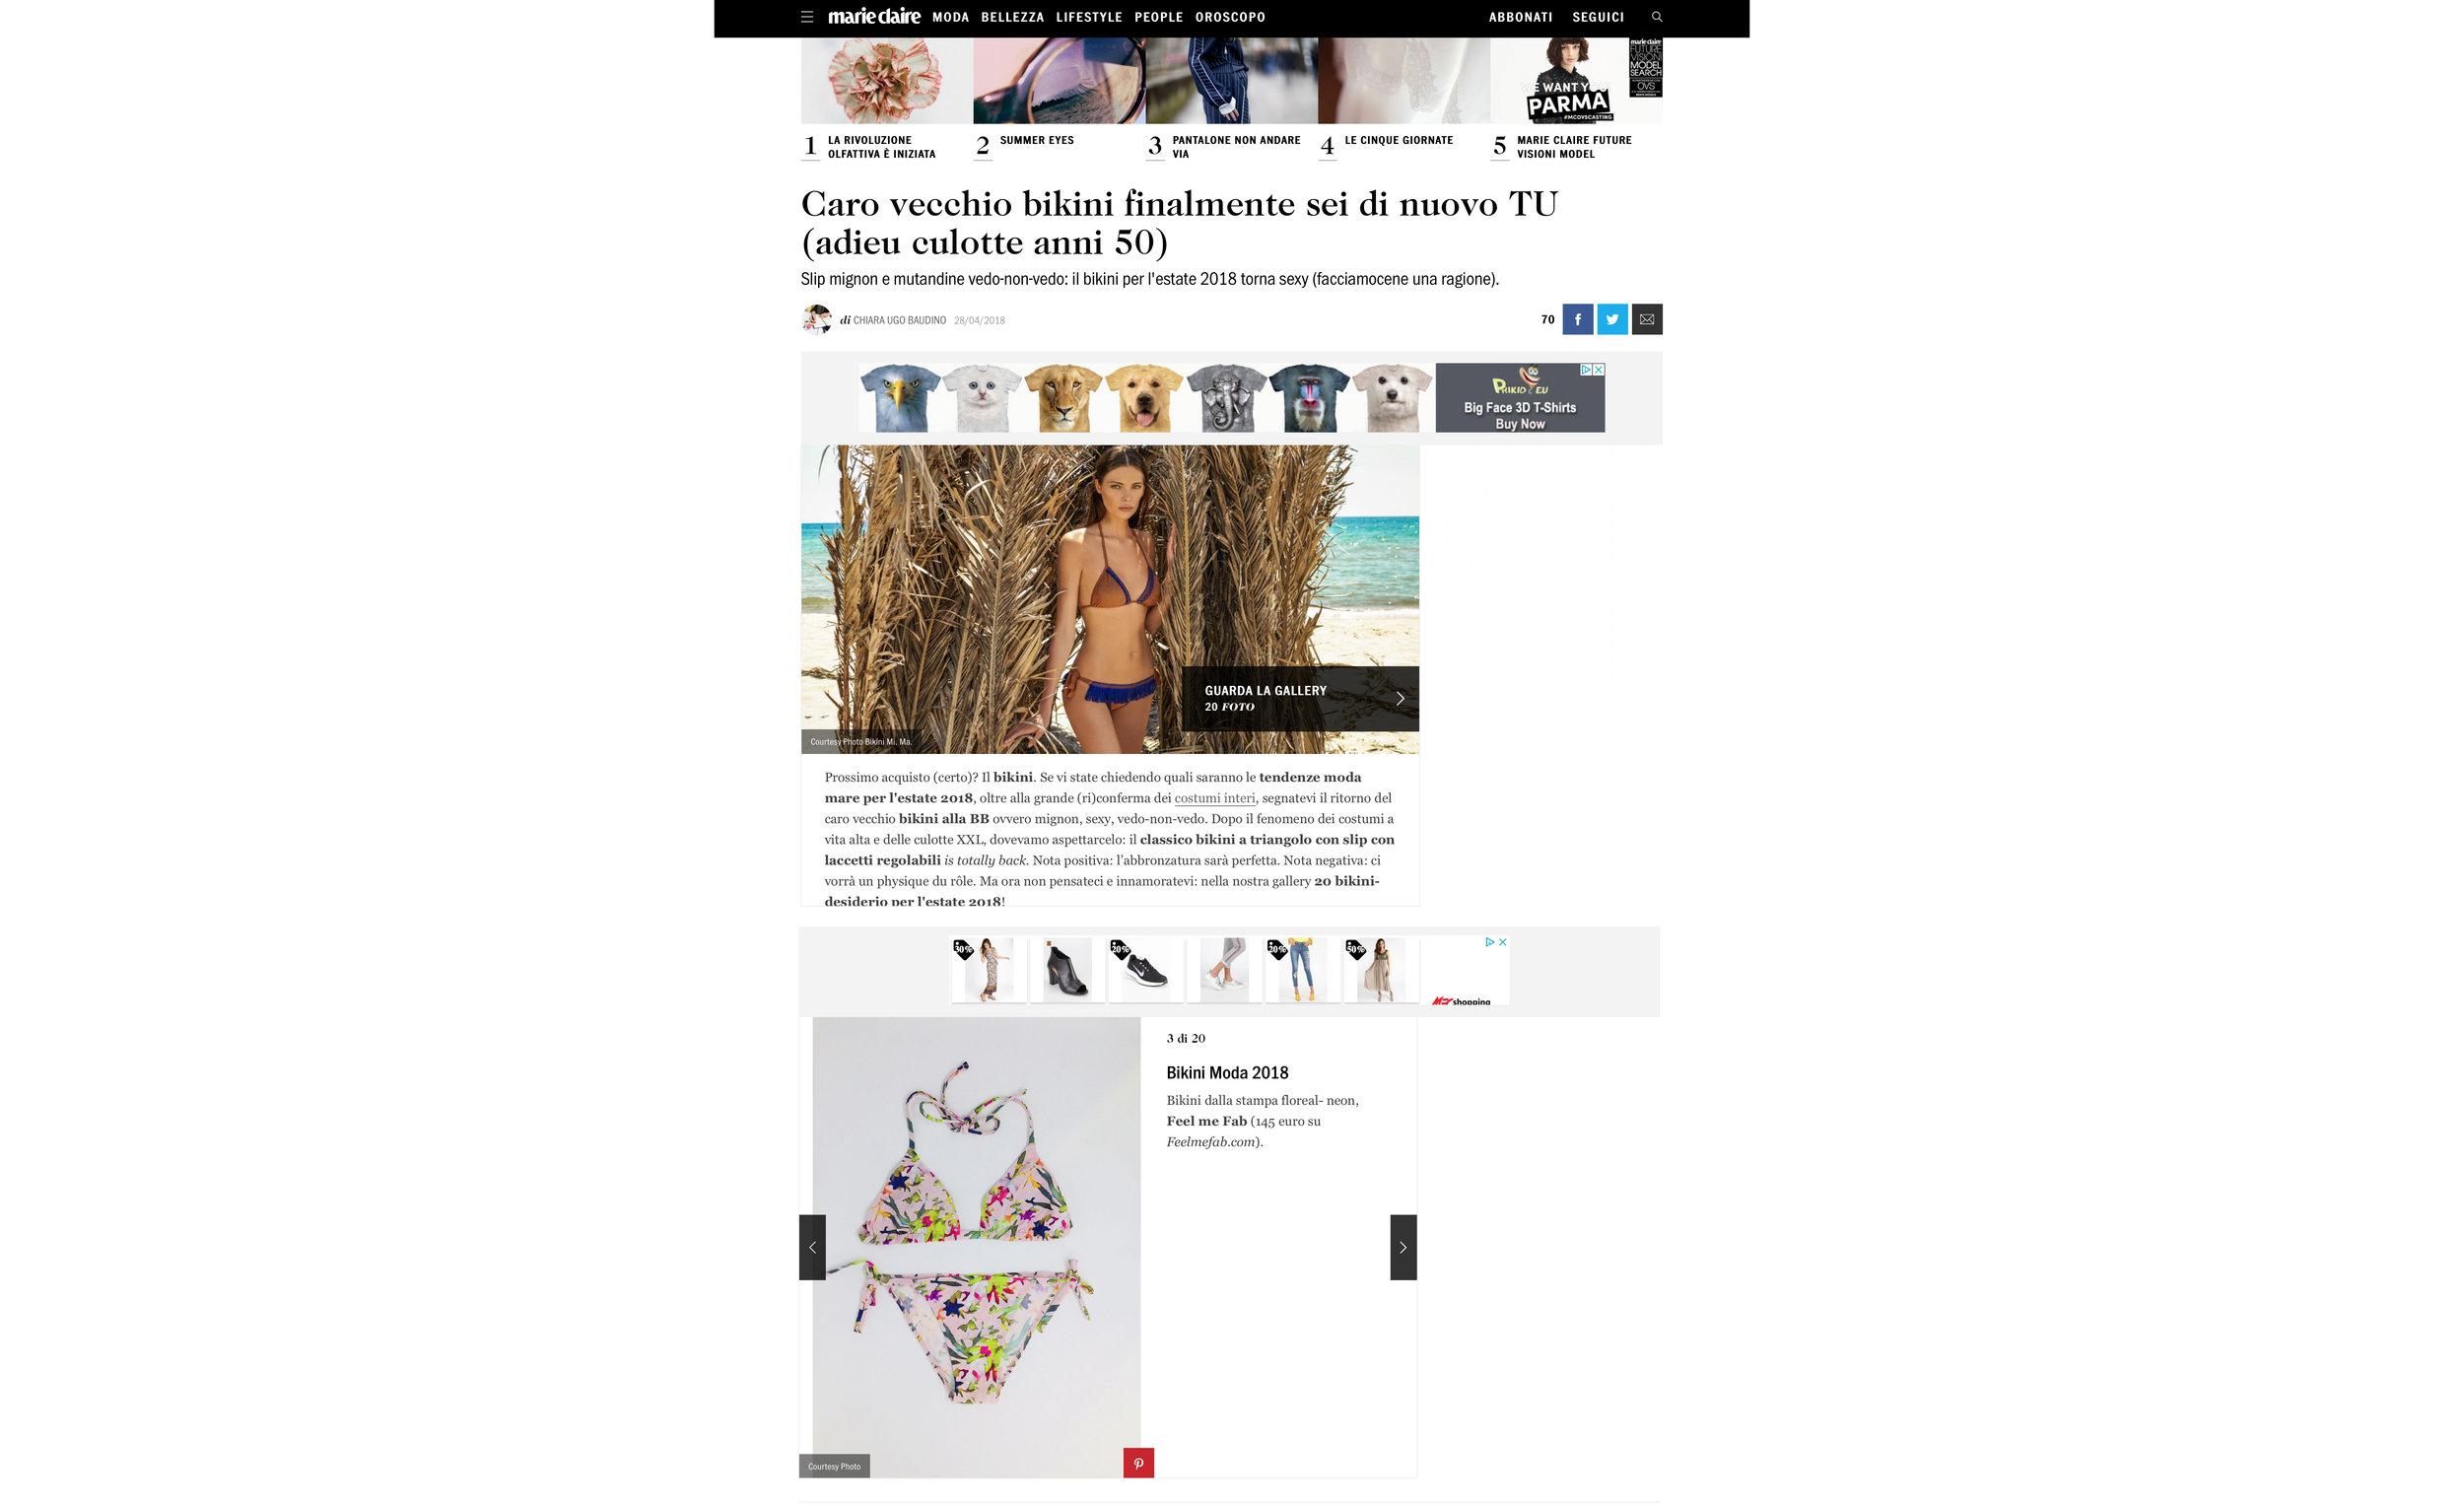 FEEL ME fab - Marieclaire maggio 2018 - bikini.jpg